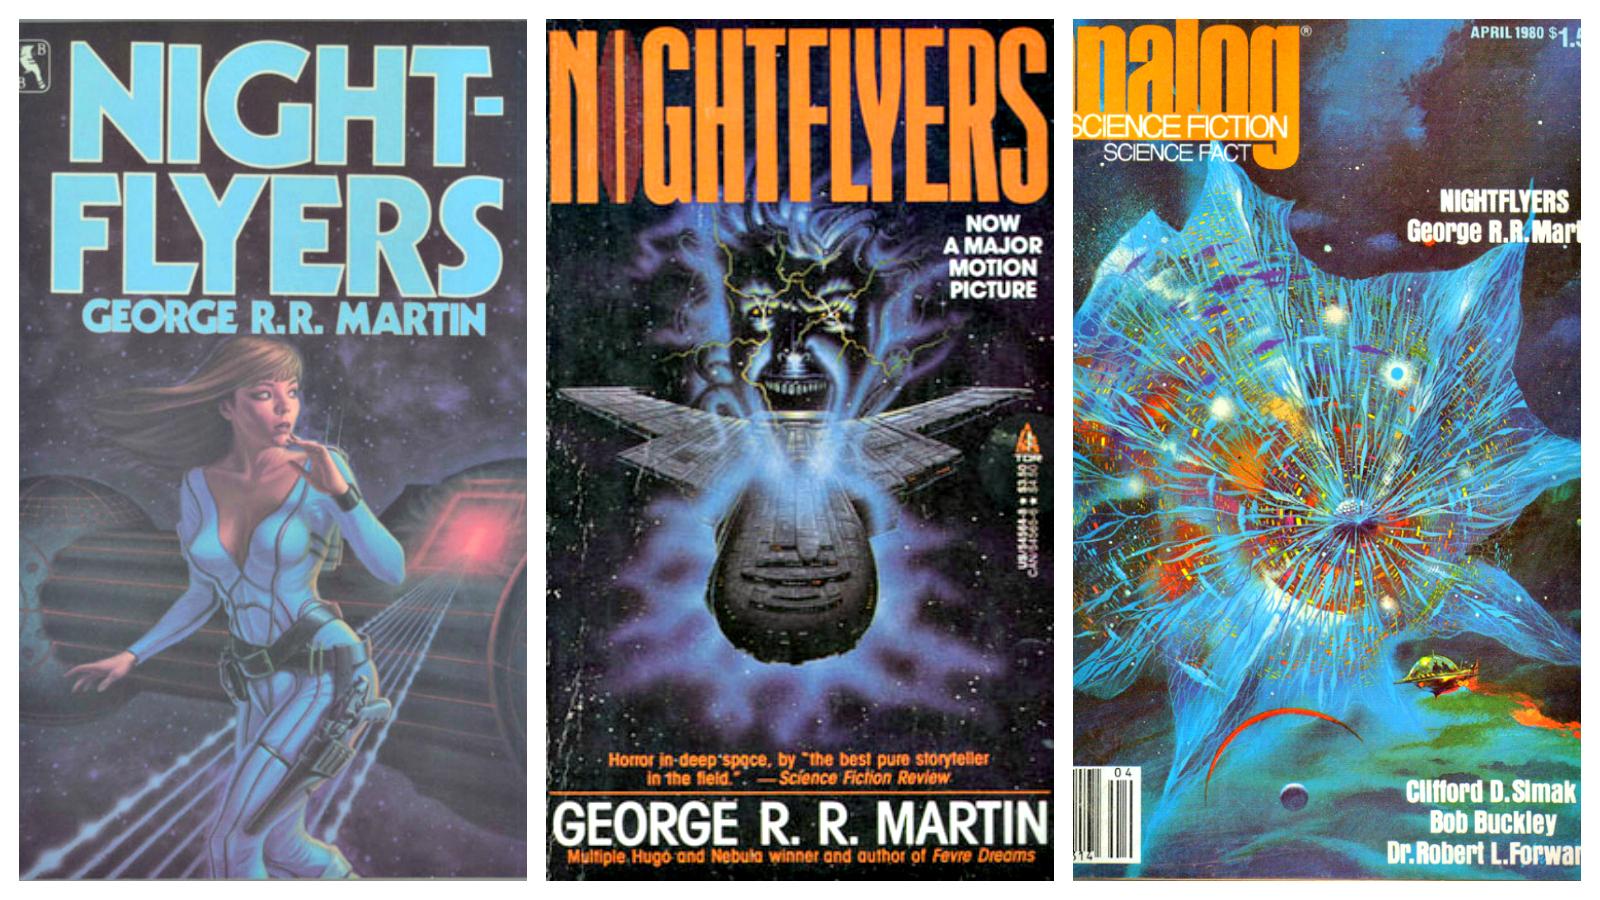 nightflyers collage